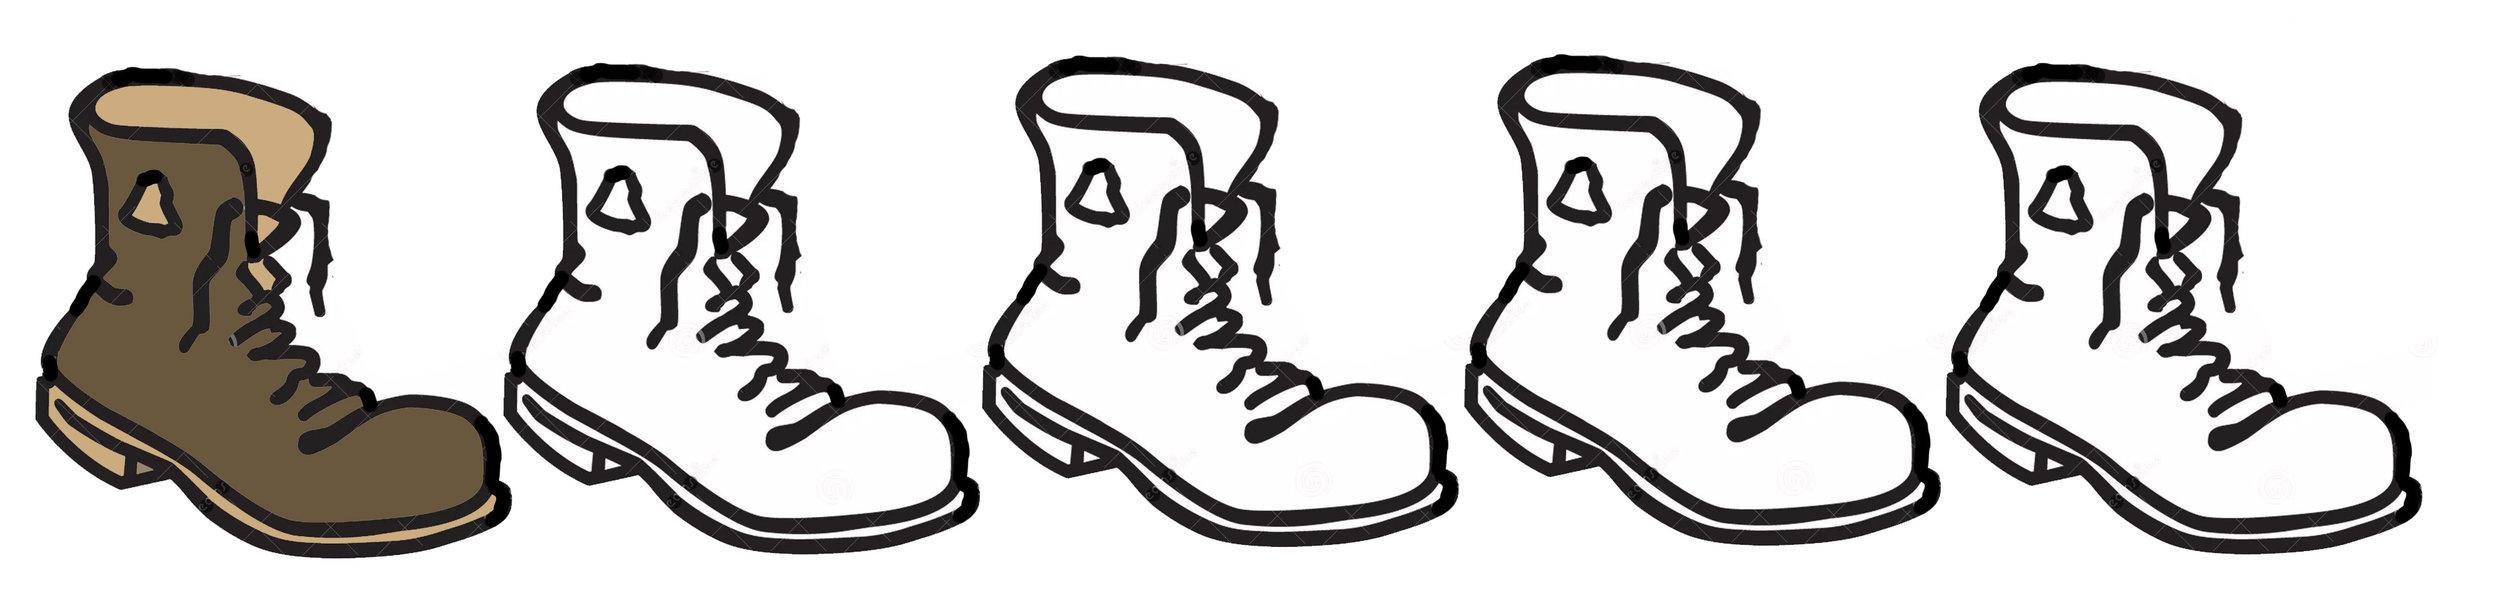 1 boot.jpg